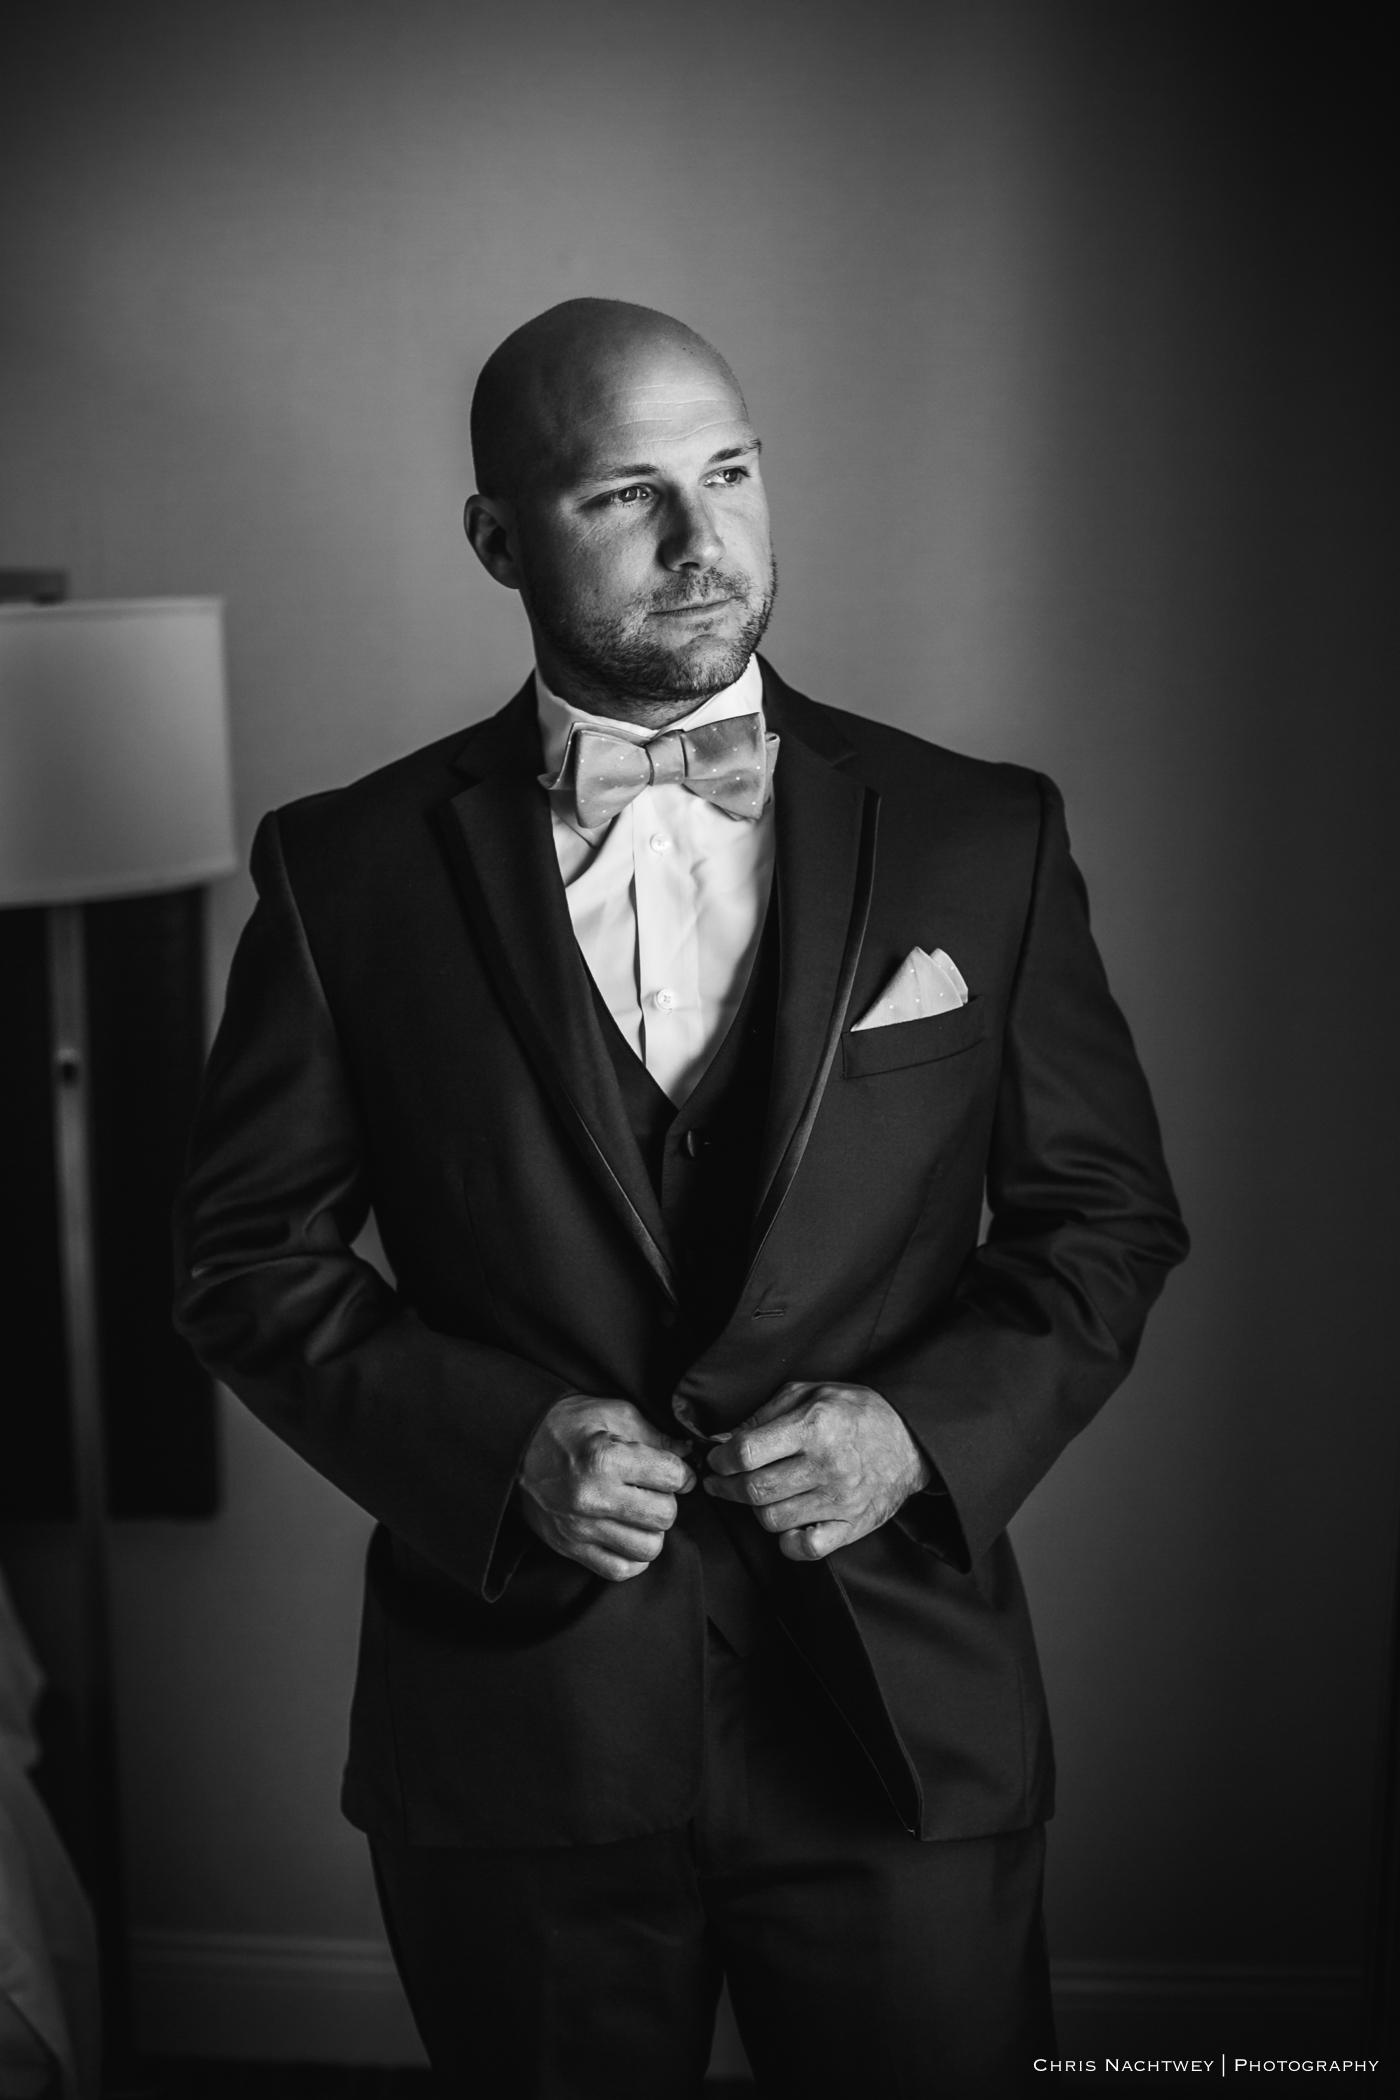 mystic-ct-artistic-wedding-photographers-chris-nachtwey-tany-mike-2017-4.jpg